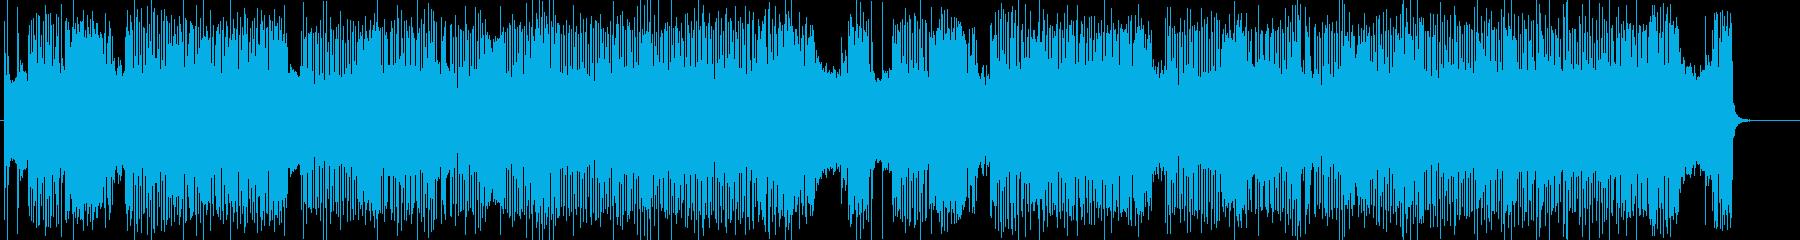 「HR/HM」「DARK/ROCK」の再生済みの波形